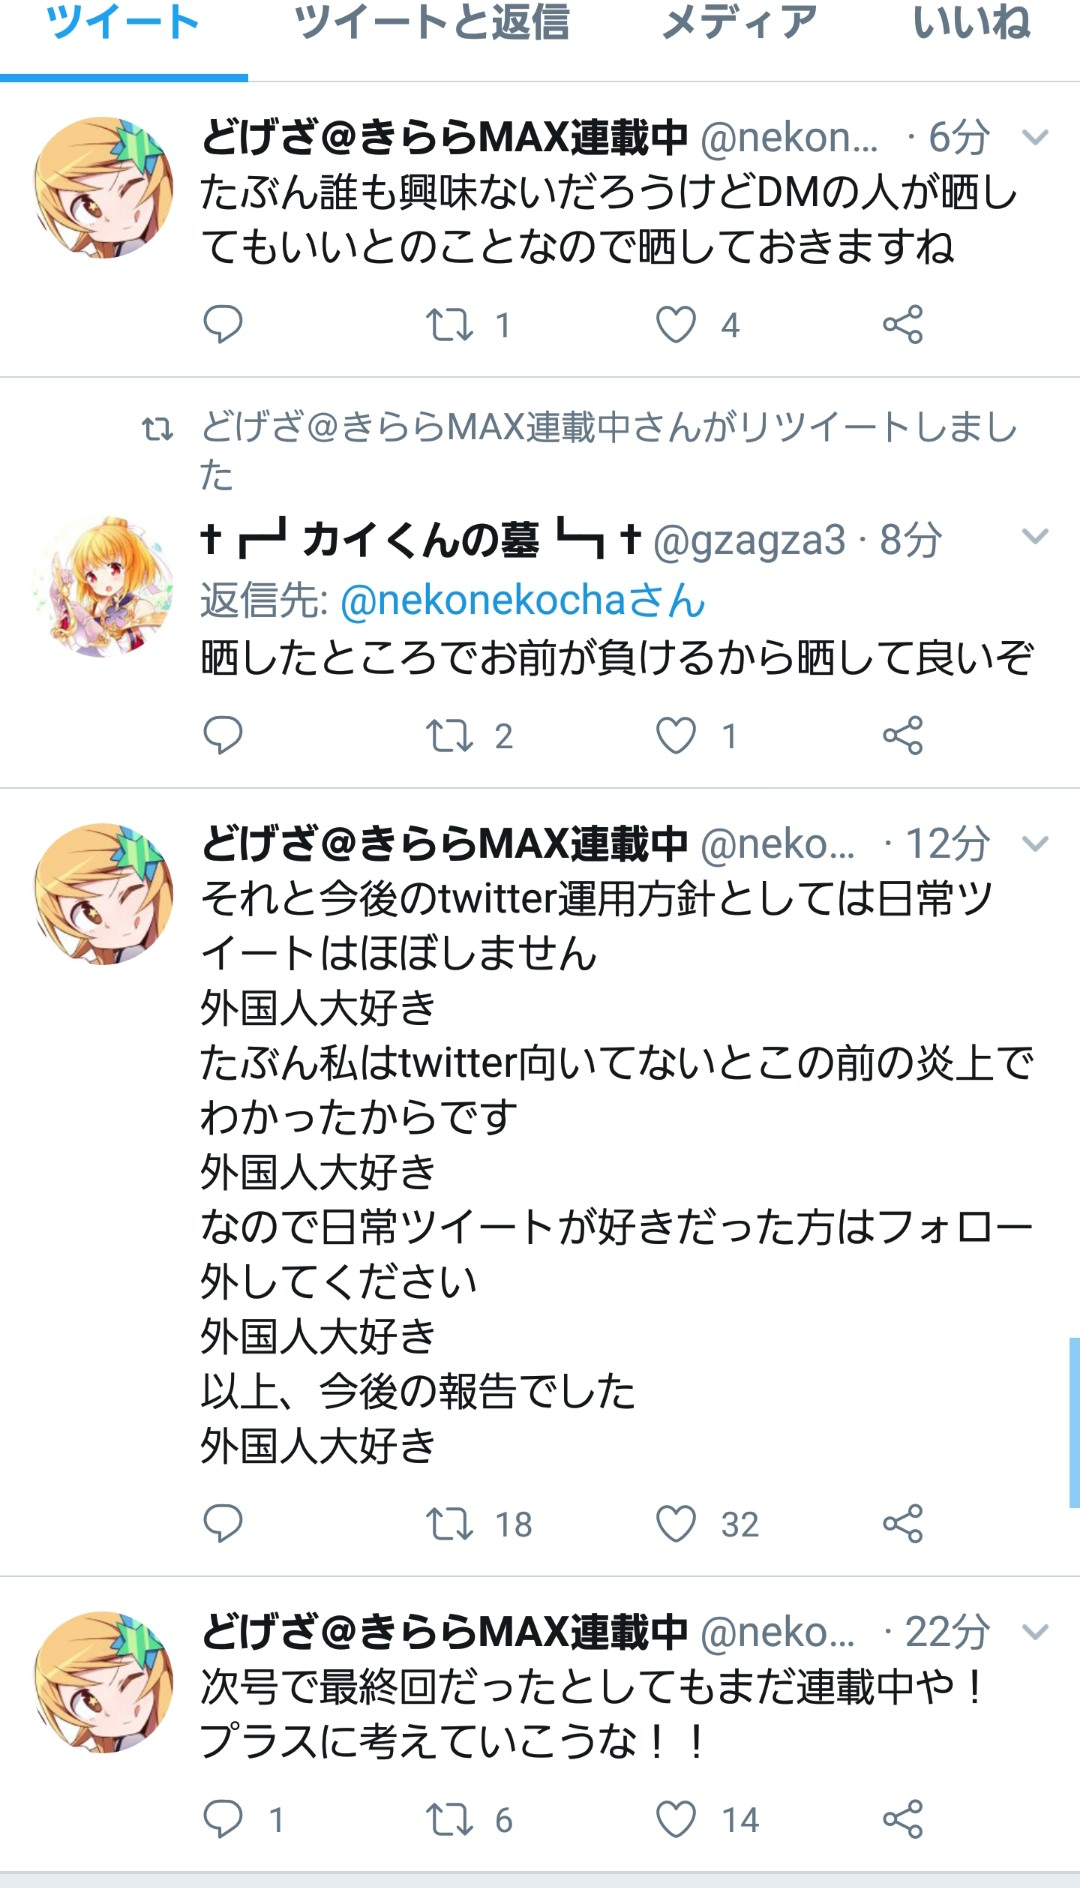 7QLwnq2.jpg